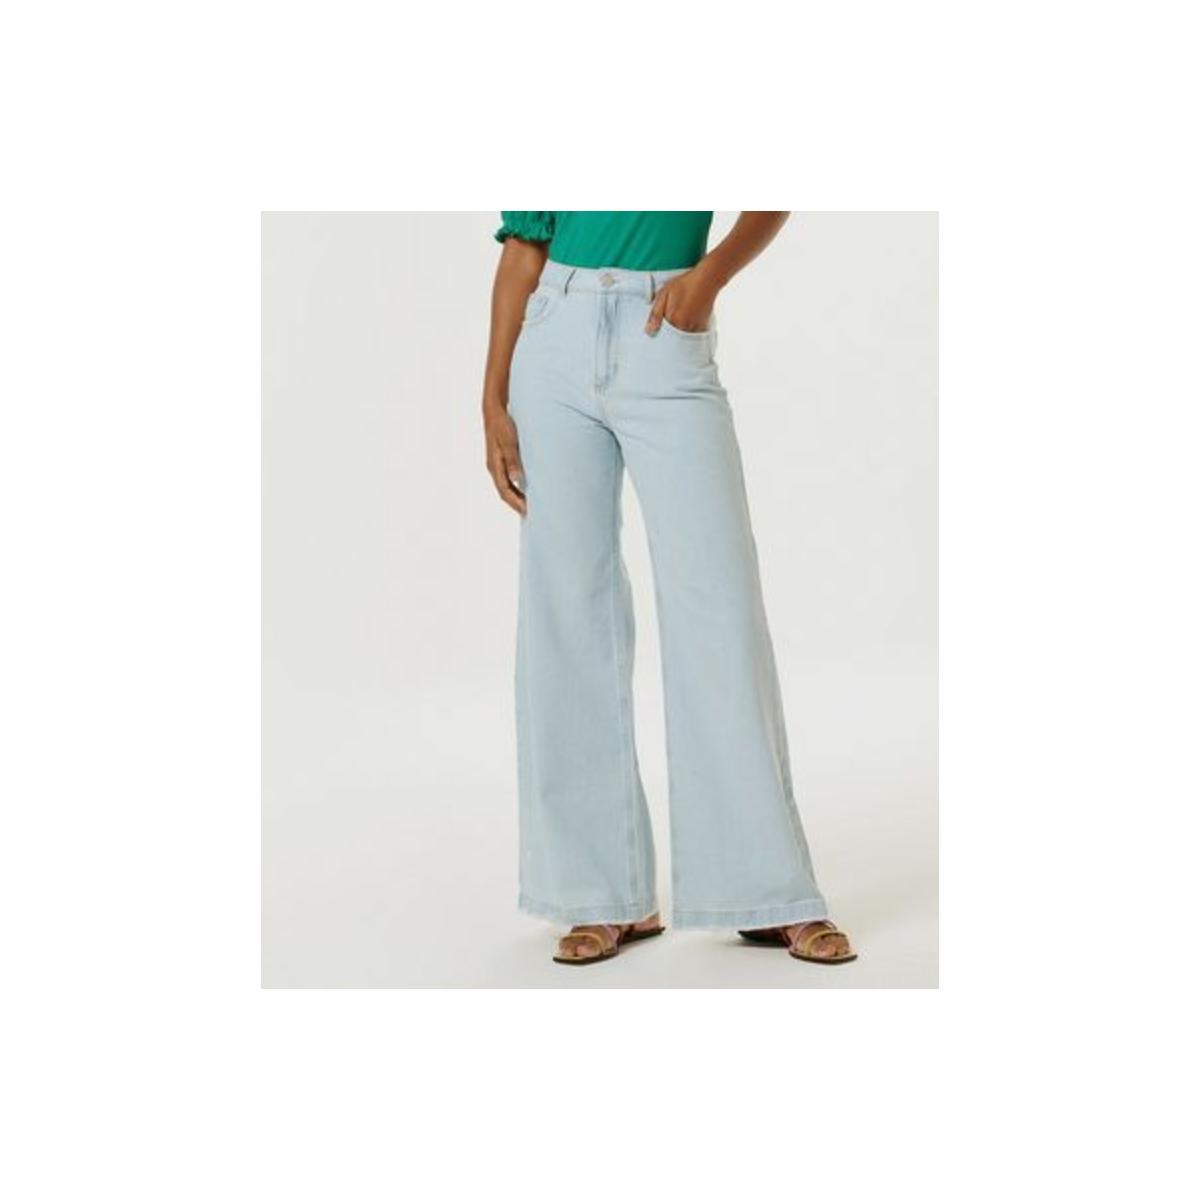 Calça Feminina Hering H9ag 1asn Jeans Claro